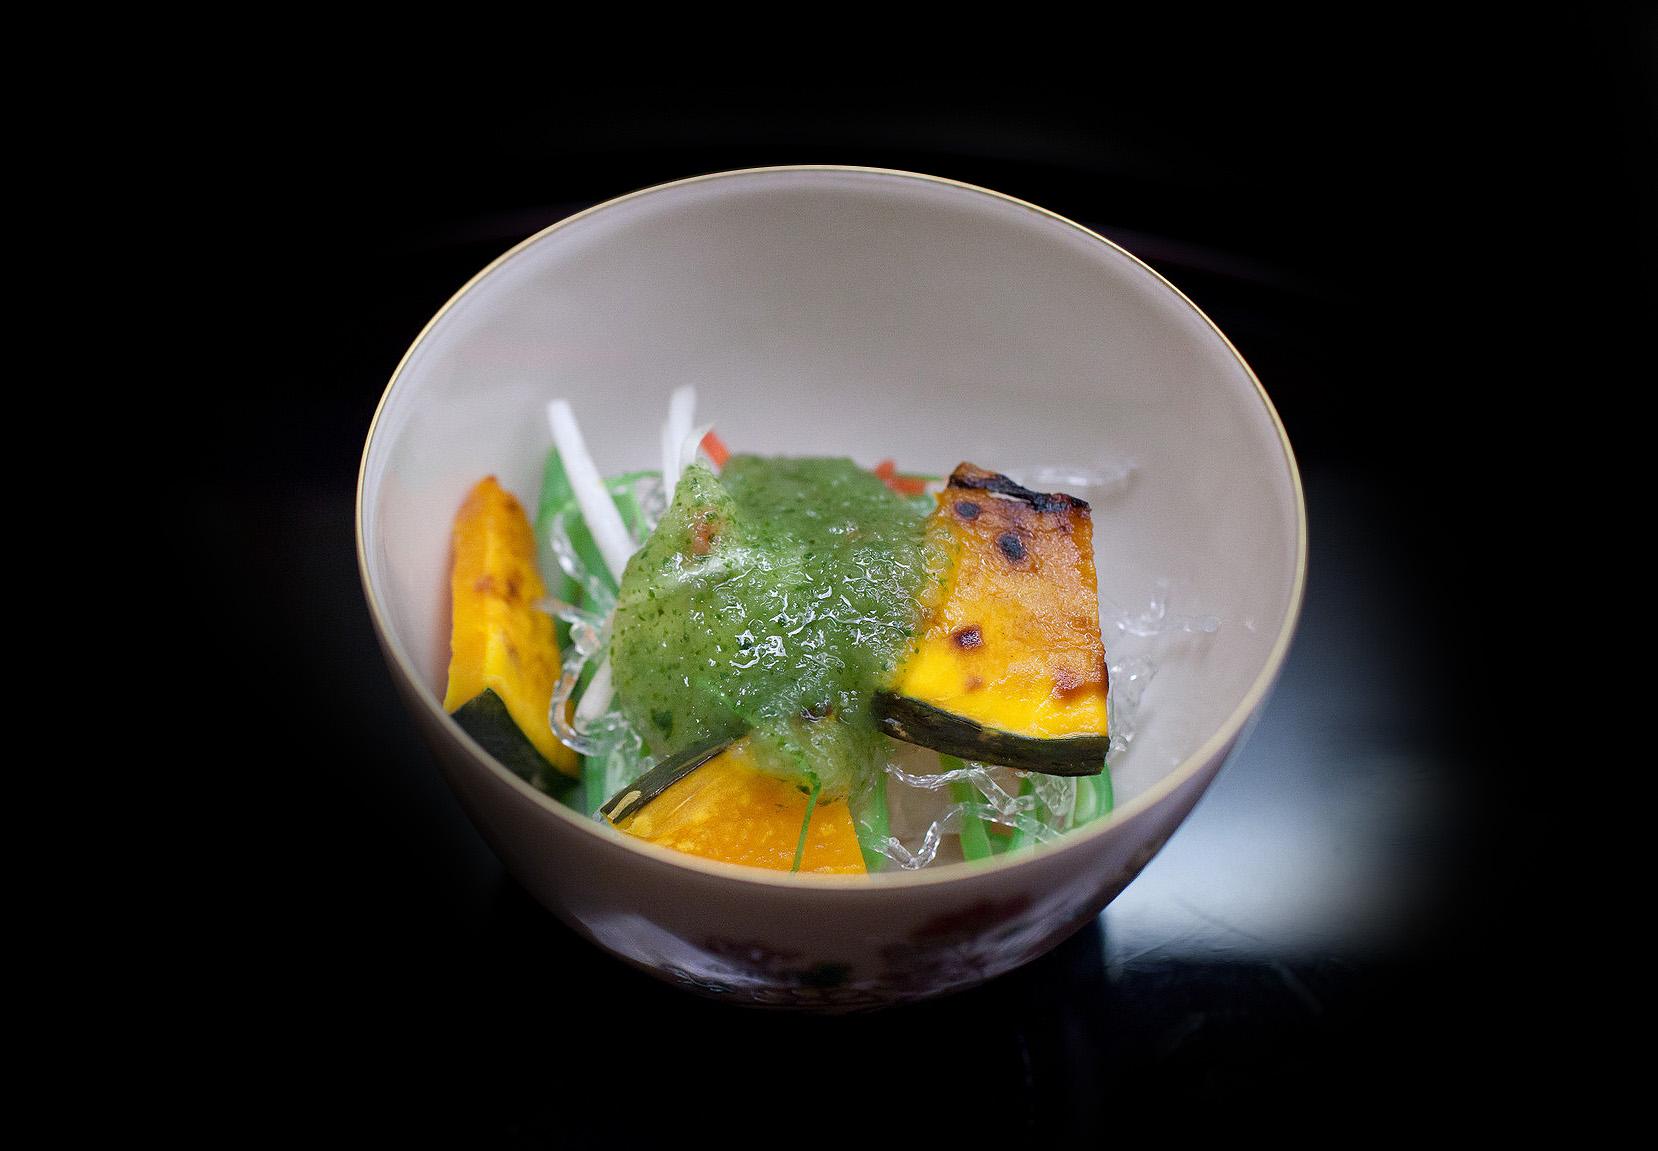 Chihana, Kyoto, Japan - Pumpkin, clear seaweed, and radish with vinegar